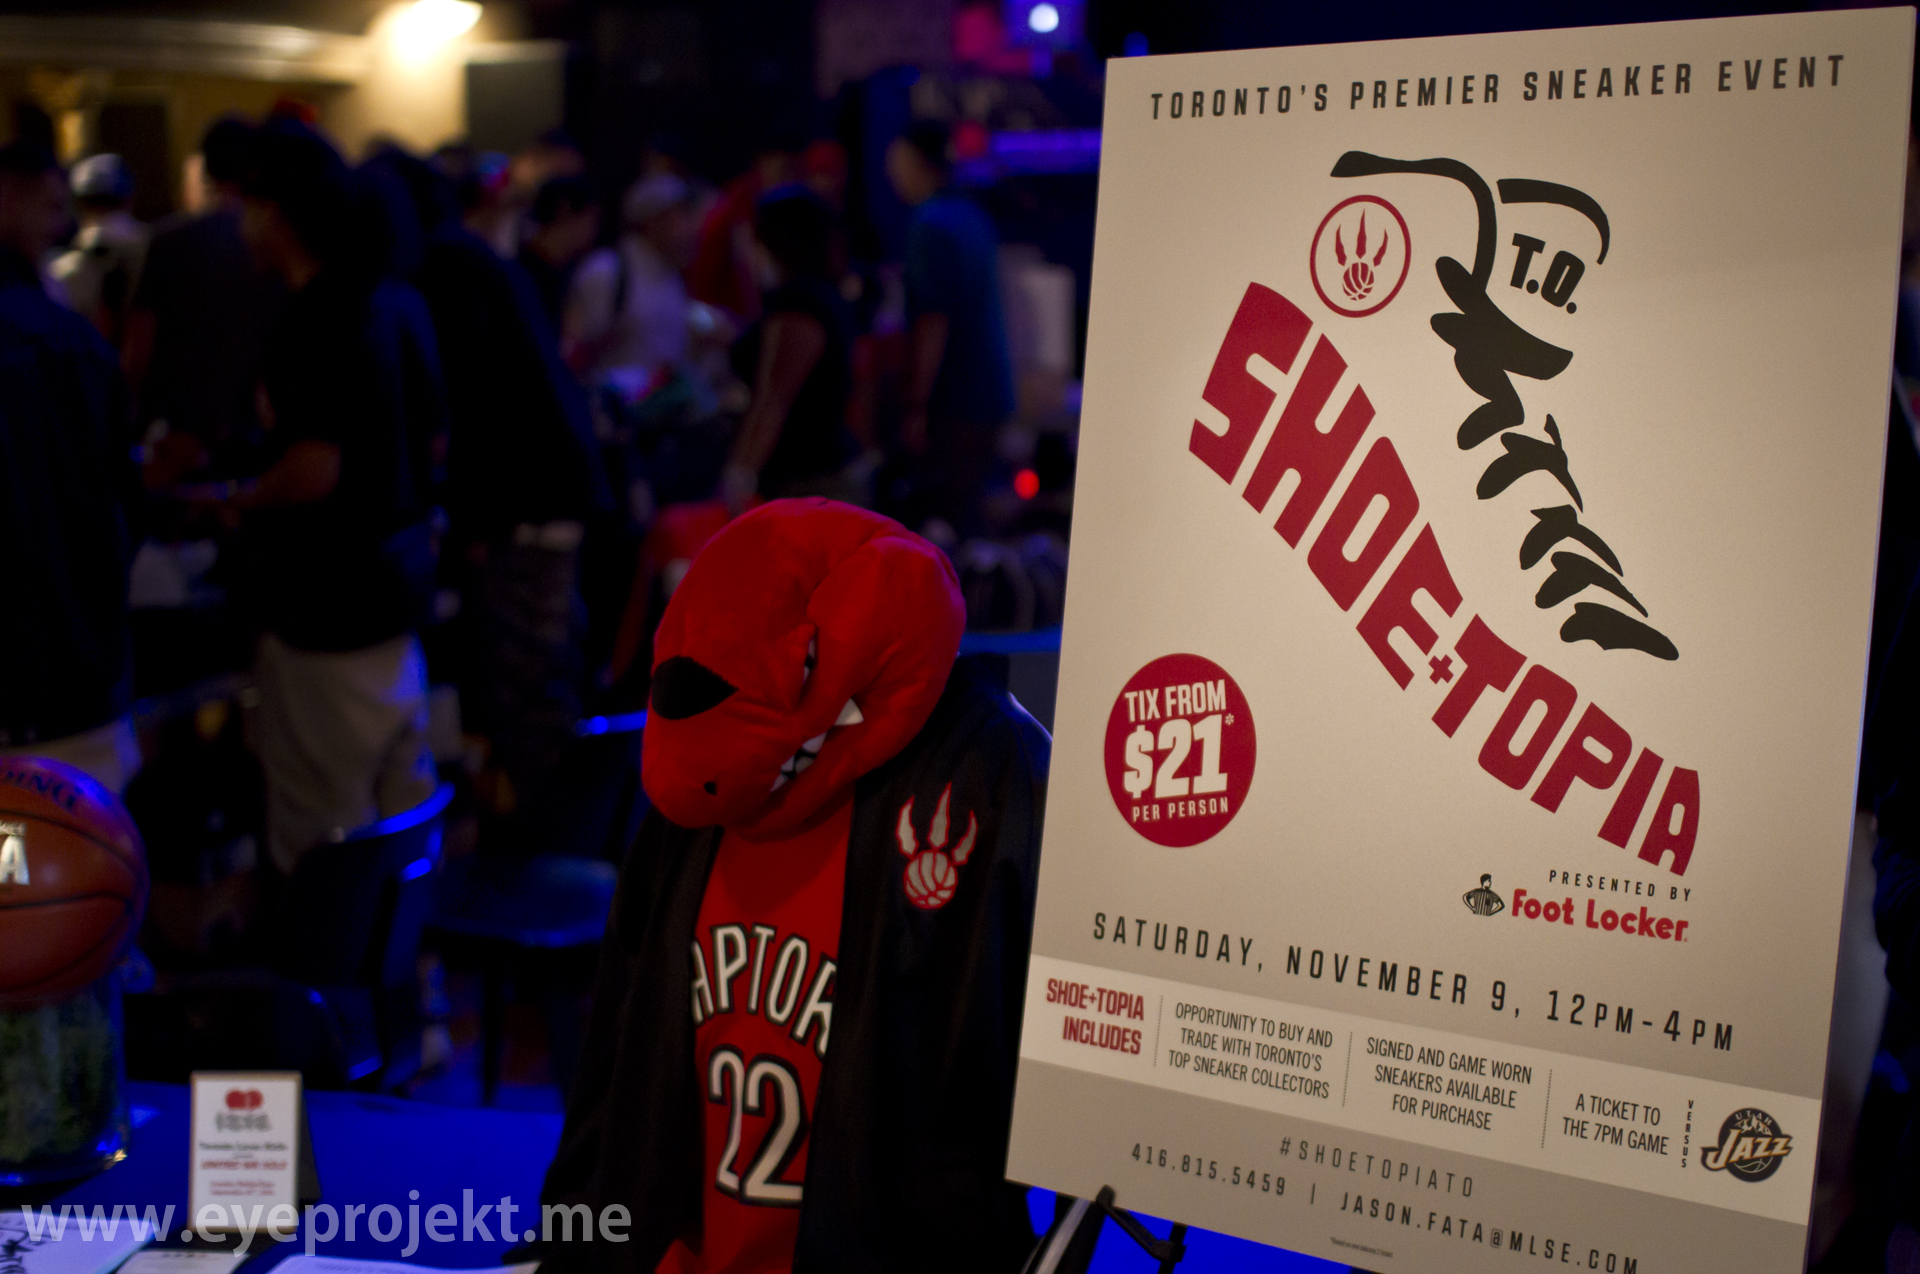 ShoeTopia live Nov 9th 2013 Toronto Air Canada Center 12pm-4pm Buy/Sell/Trade Sneaker Showcase